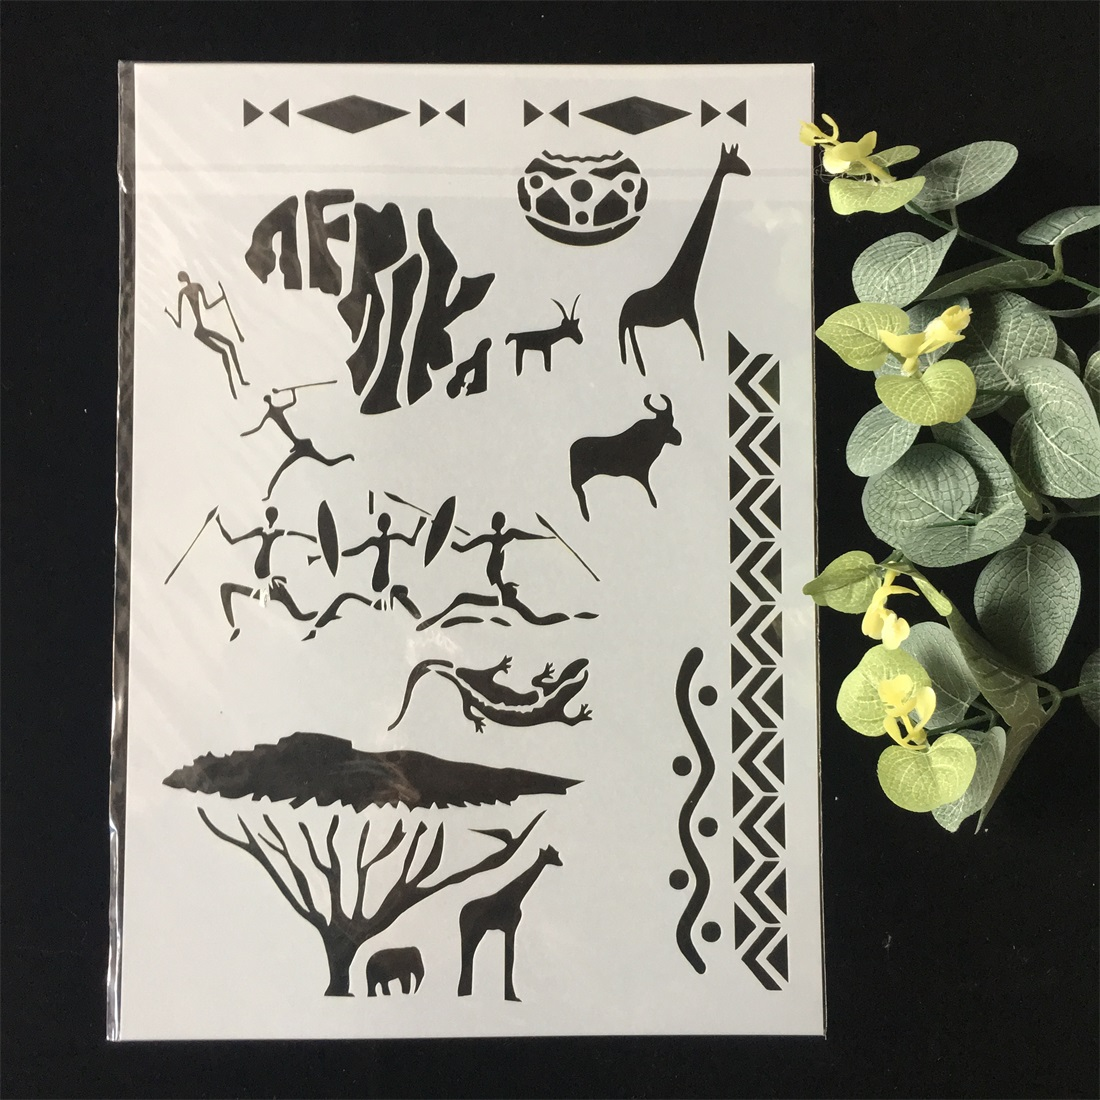 Craft//Card Making CraftAddictionUK 3 Piece Layering Flower Die Cutter